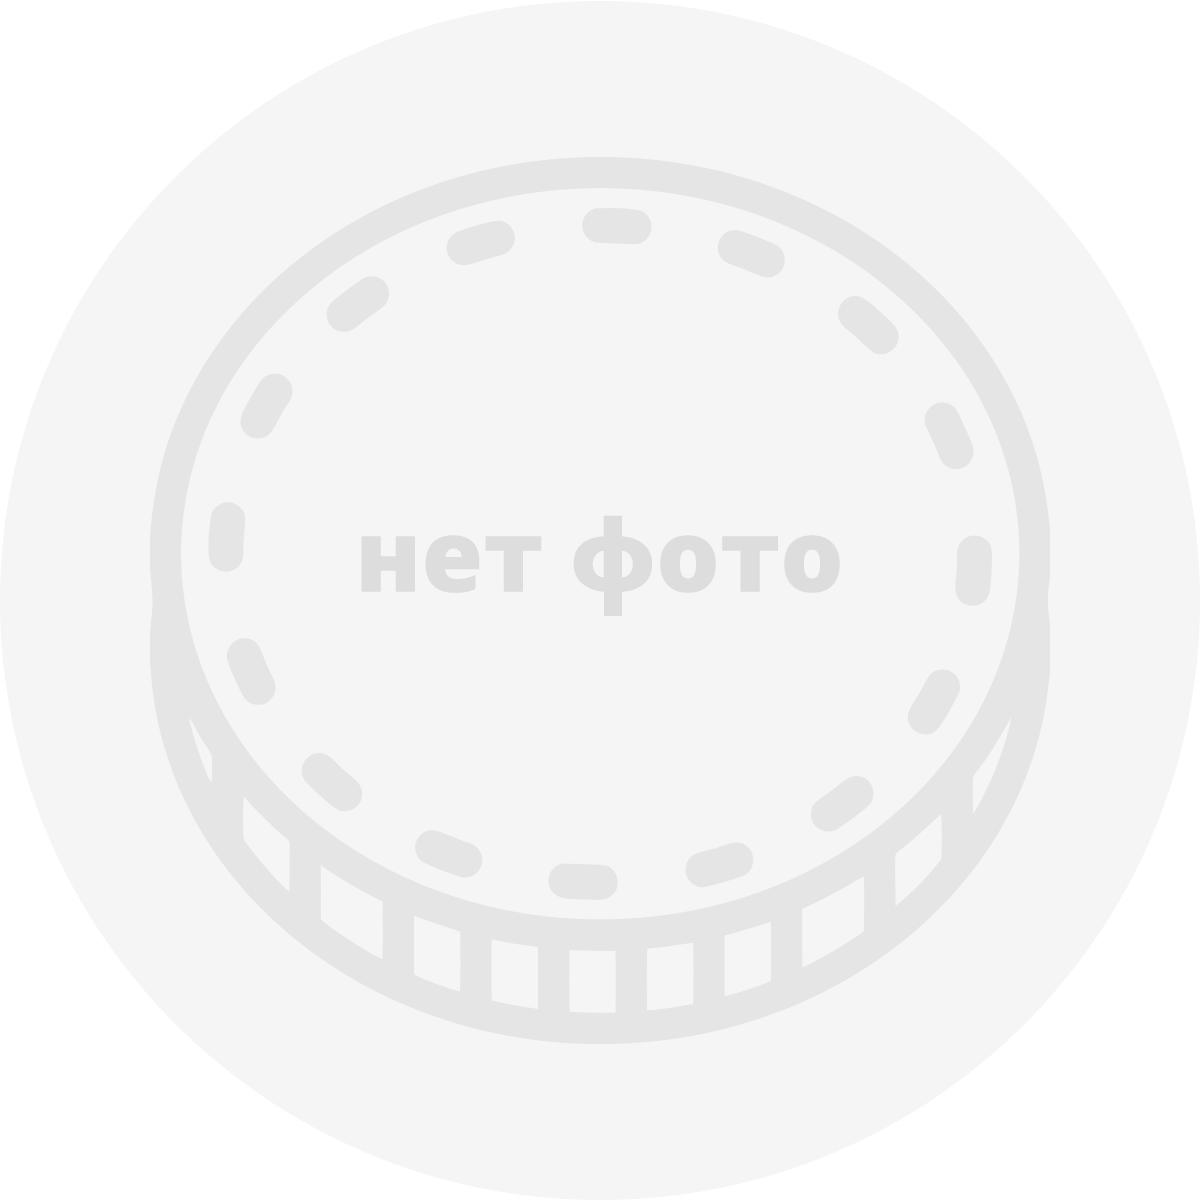 Лупа LU 170 (с подсветкой)